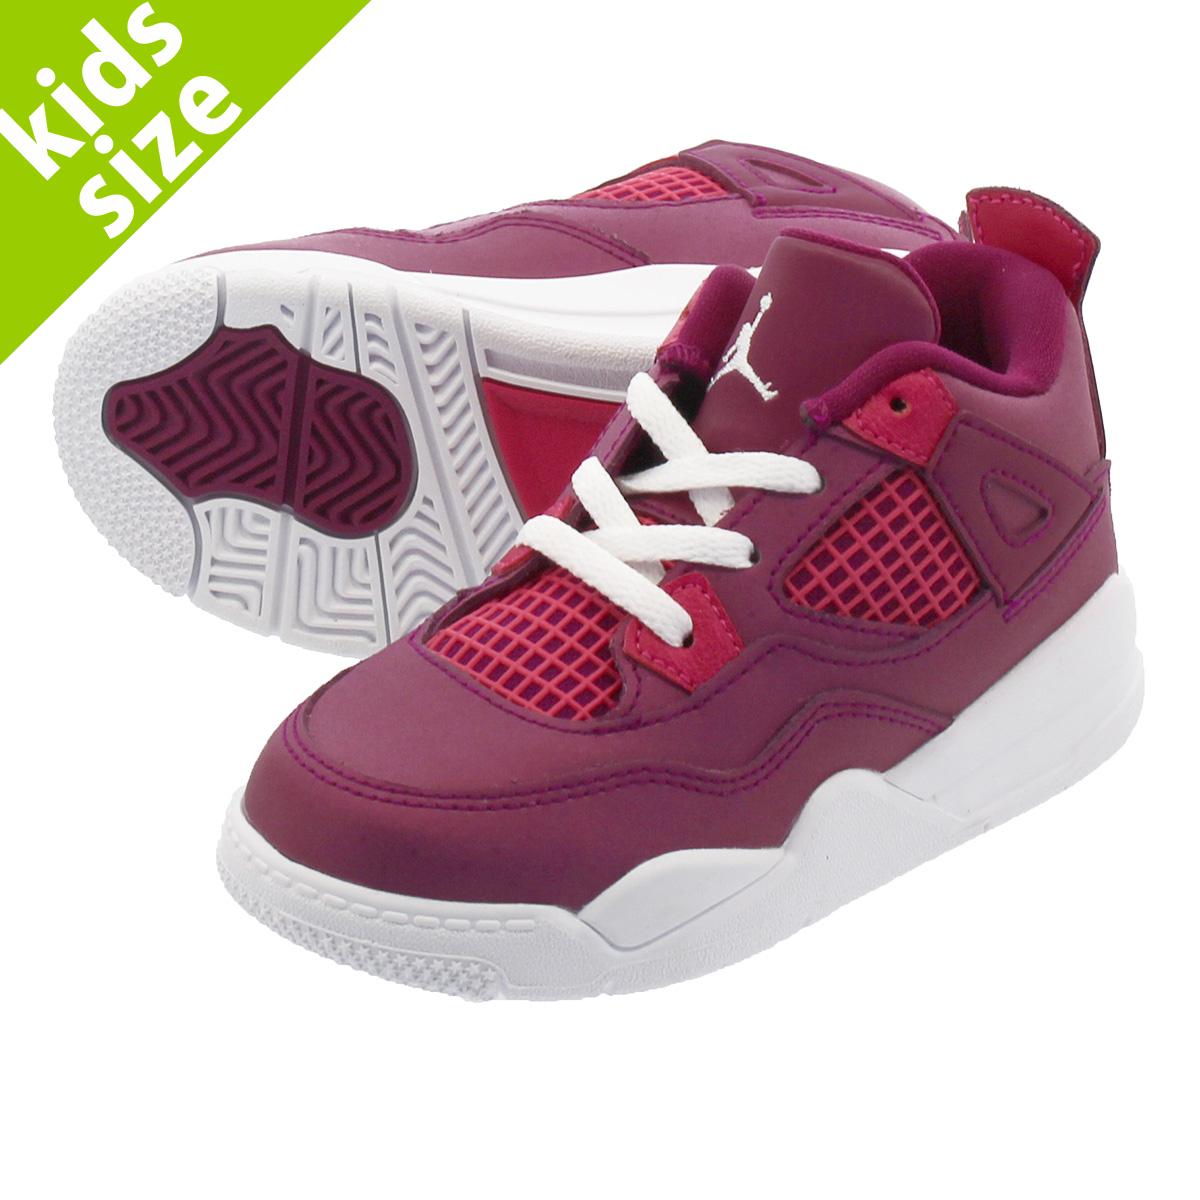 online store cda02 b0a4e NIKE AIR JORDAN 4 RETRO TD Nike Air Jordan 4 nostalgic TD TRUE BERRY RUSH  PINK WHITE bq7672-661